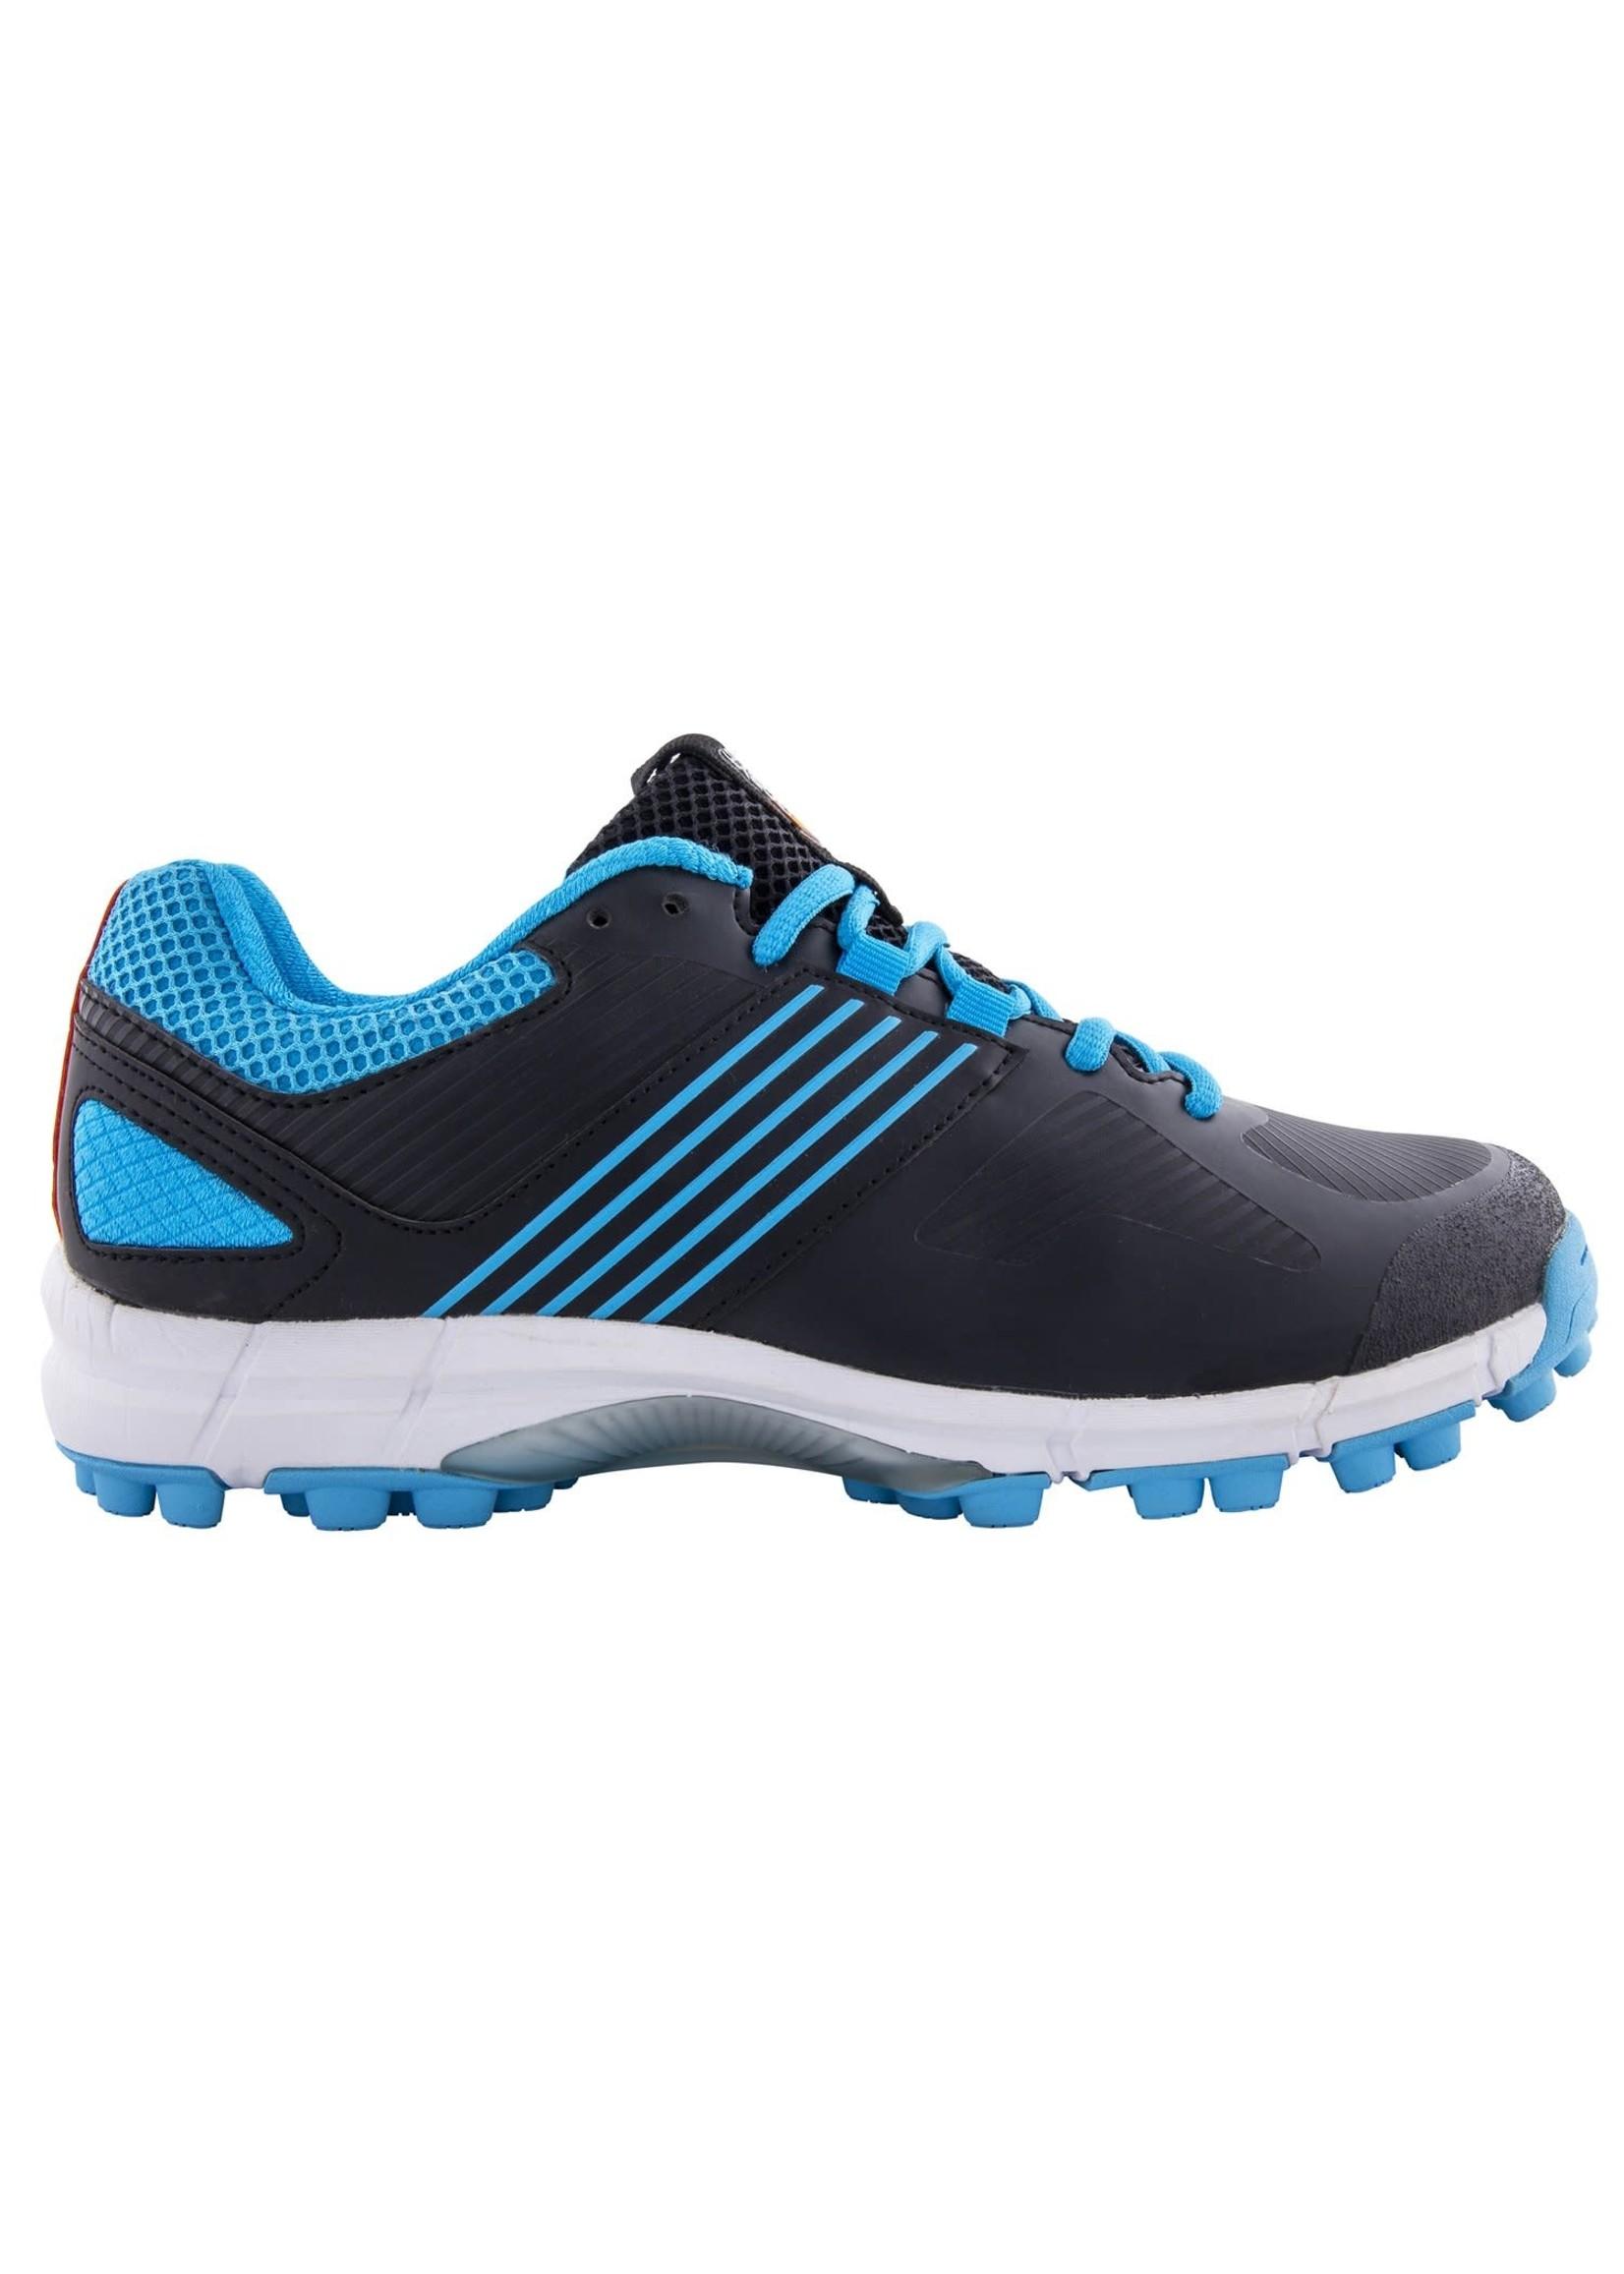 Grays Grays Flash 2.0 Hockey Shoe (2020), Black/Blue